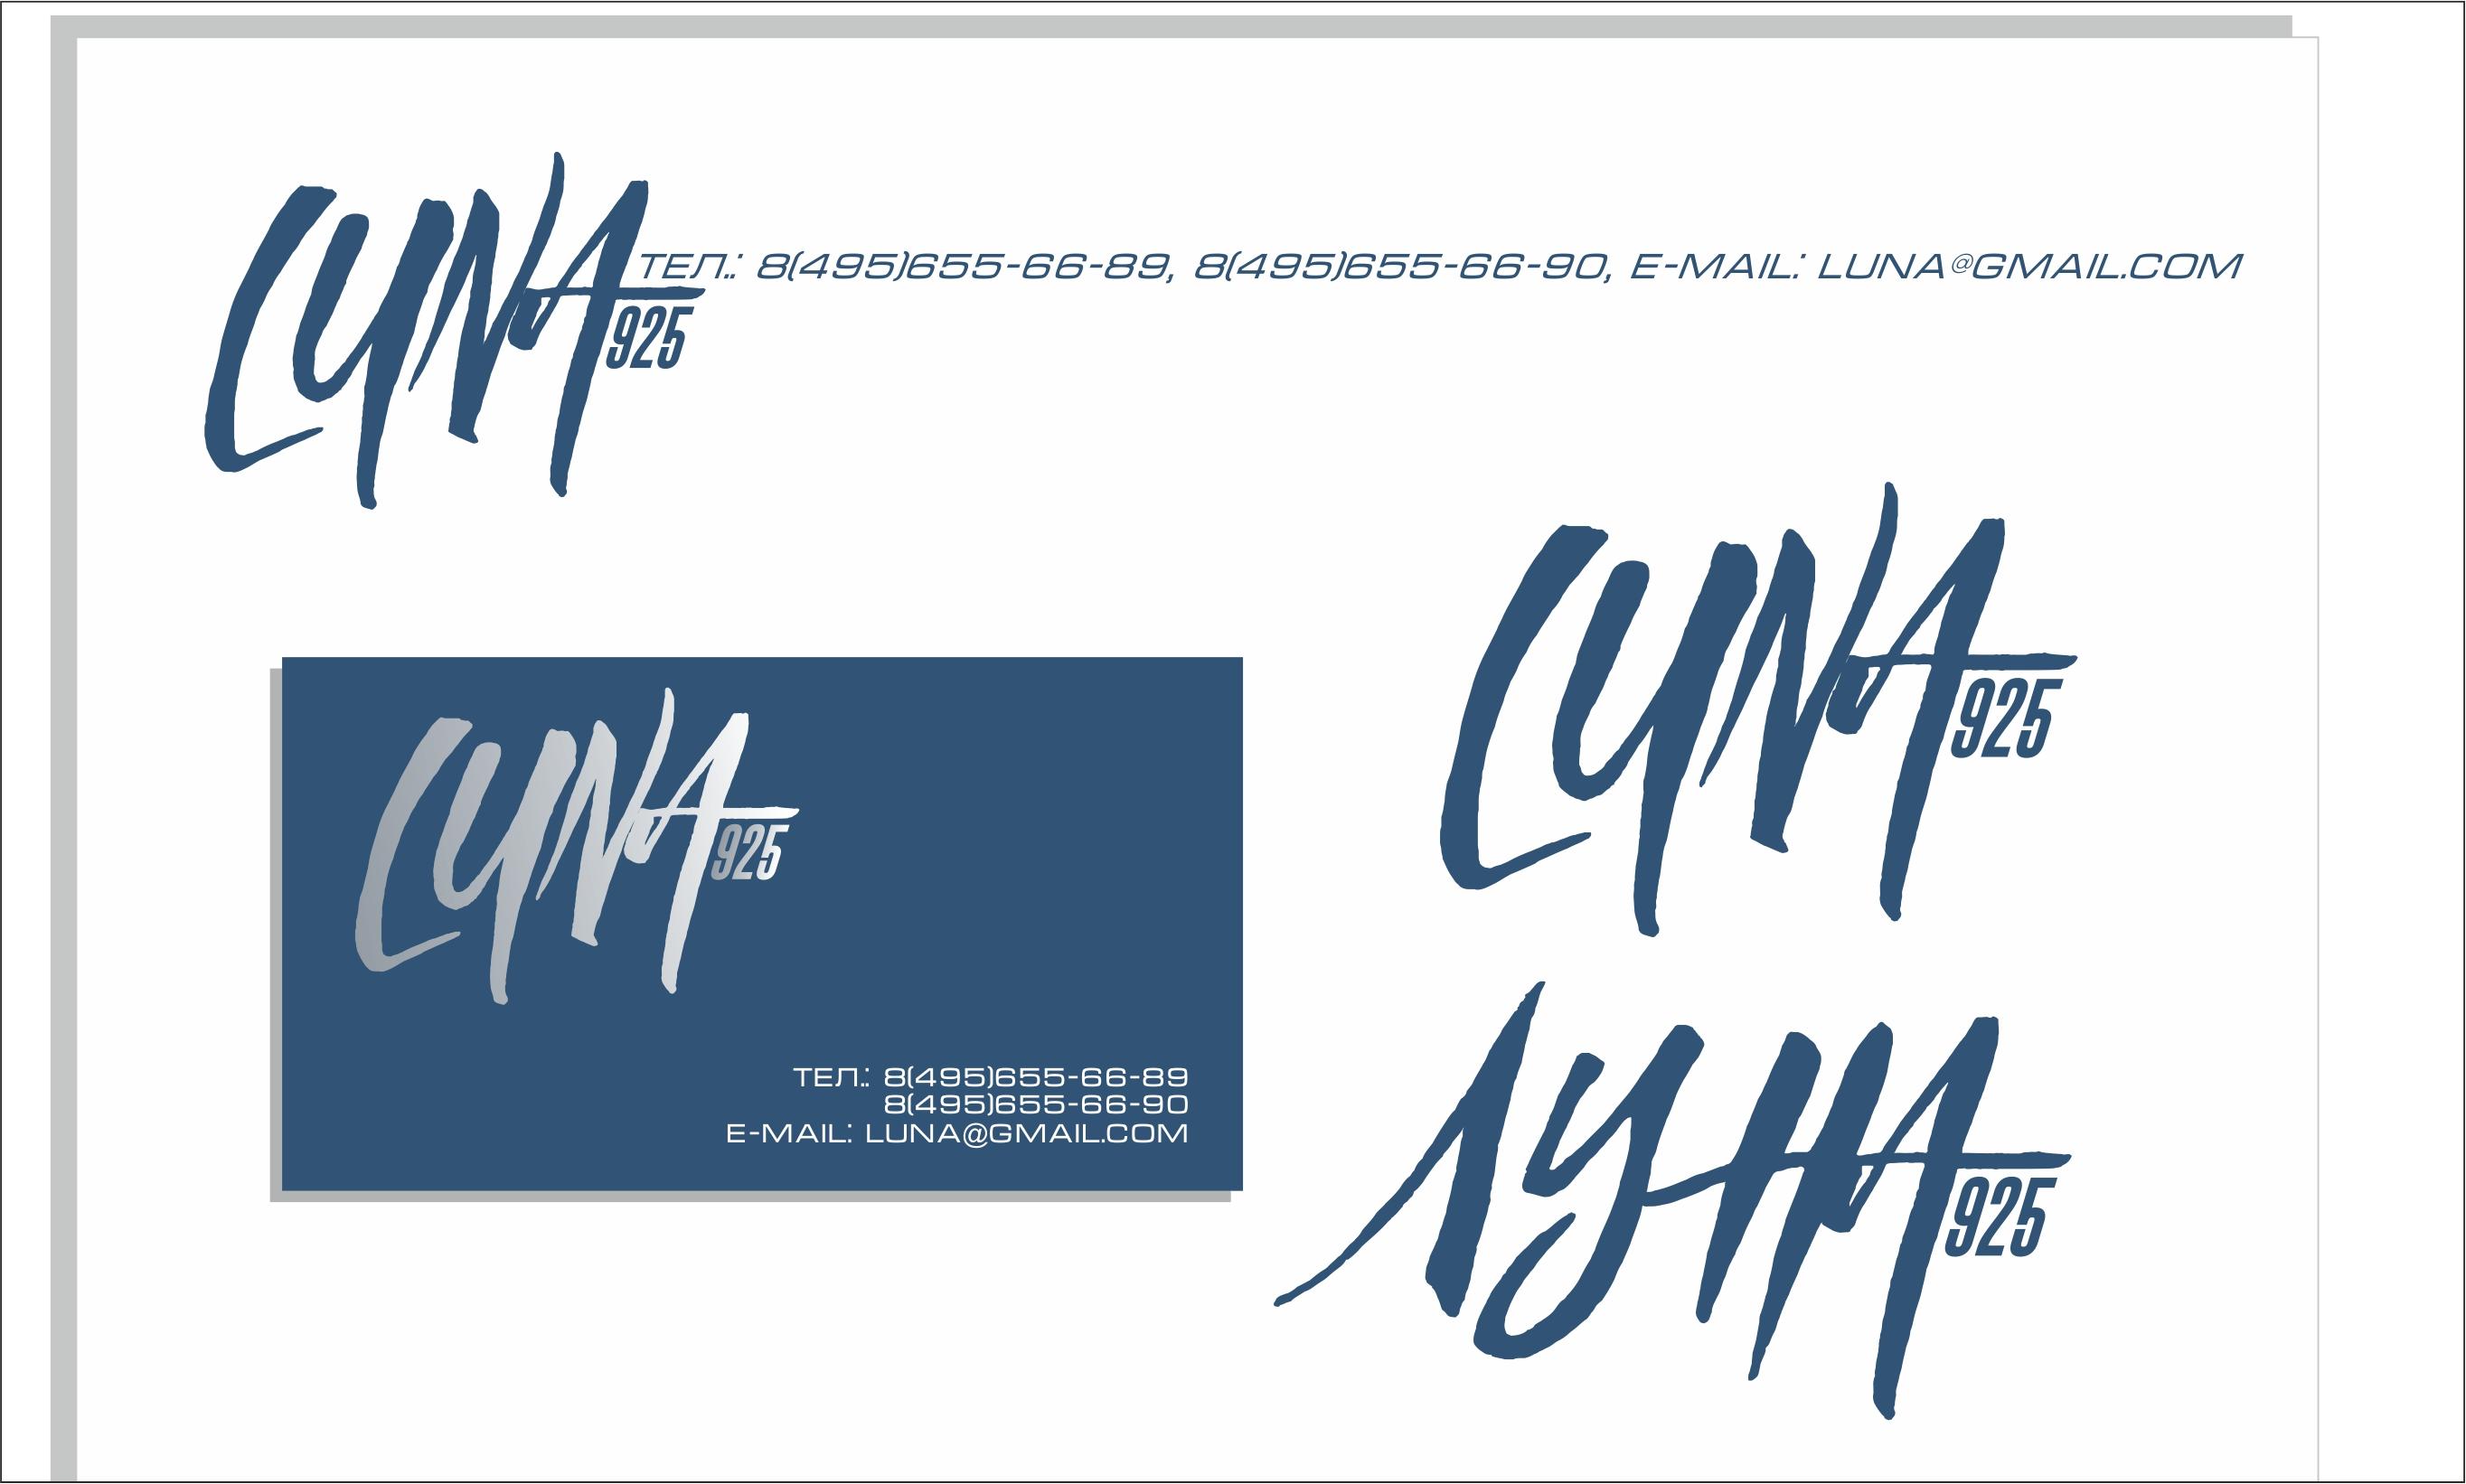 Логотип для столового серебра и посуды из серебра фото f_1315babe19b41400.jpg